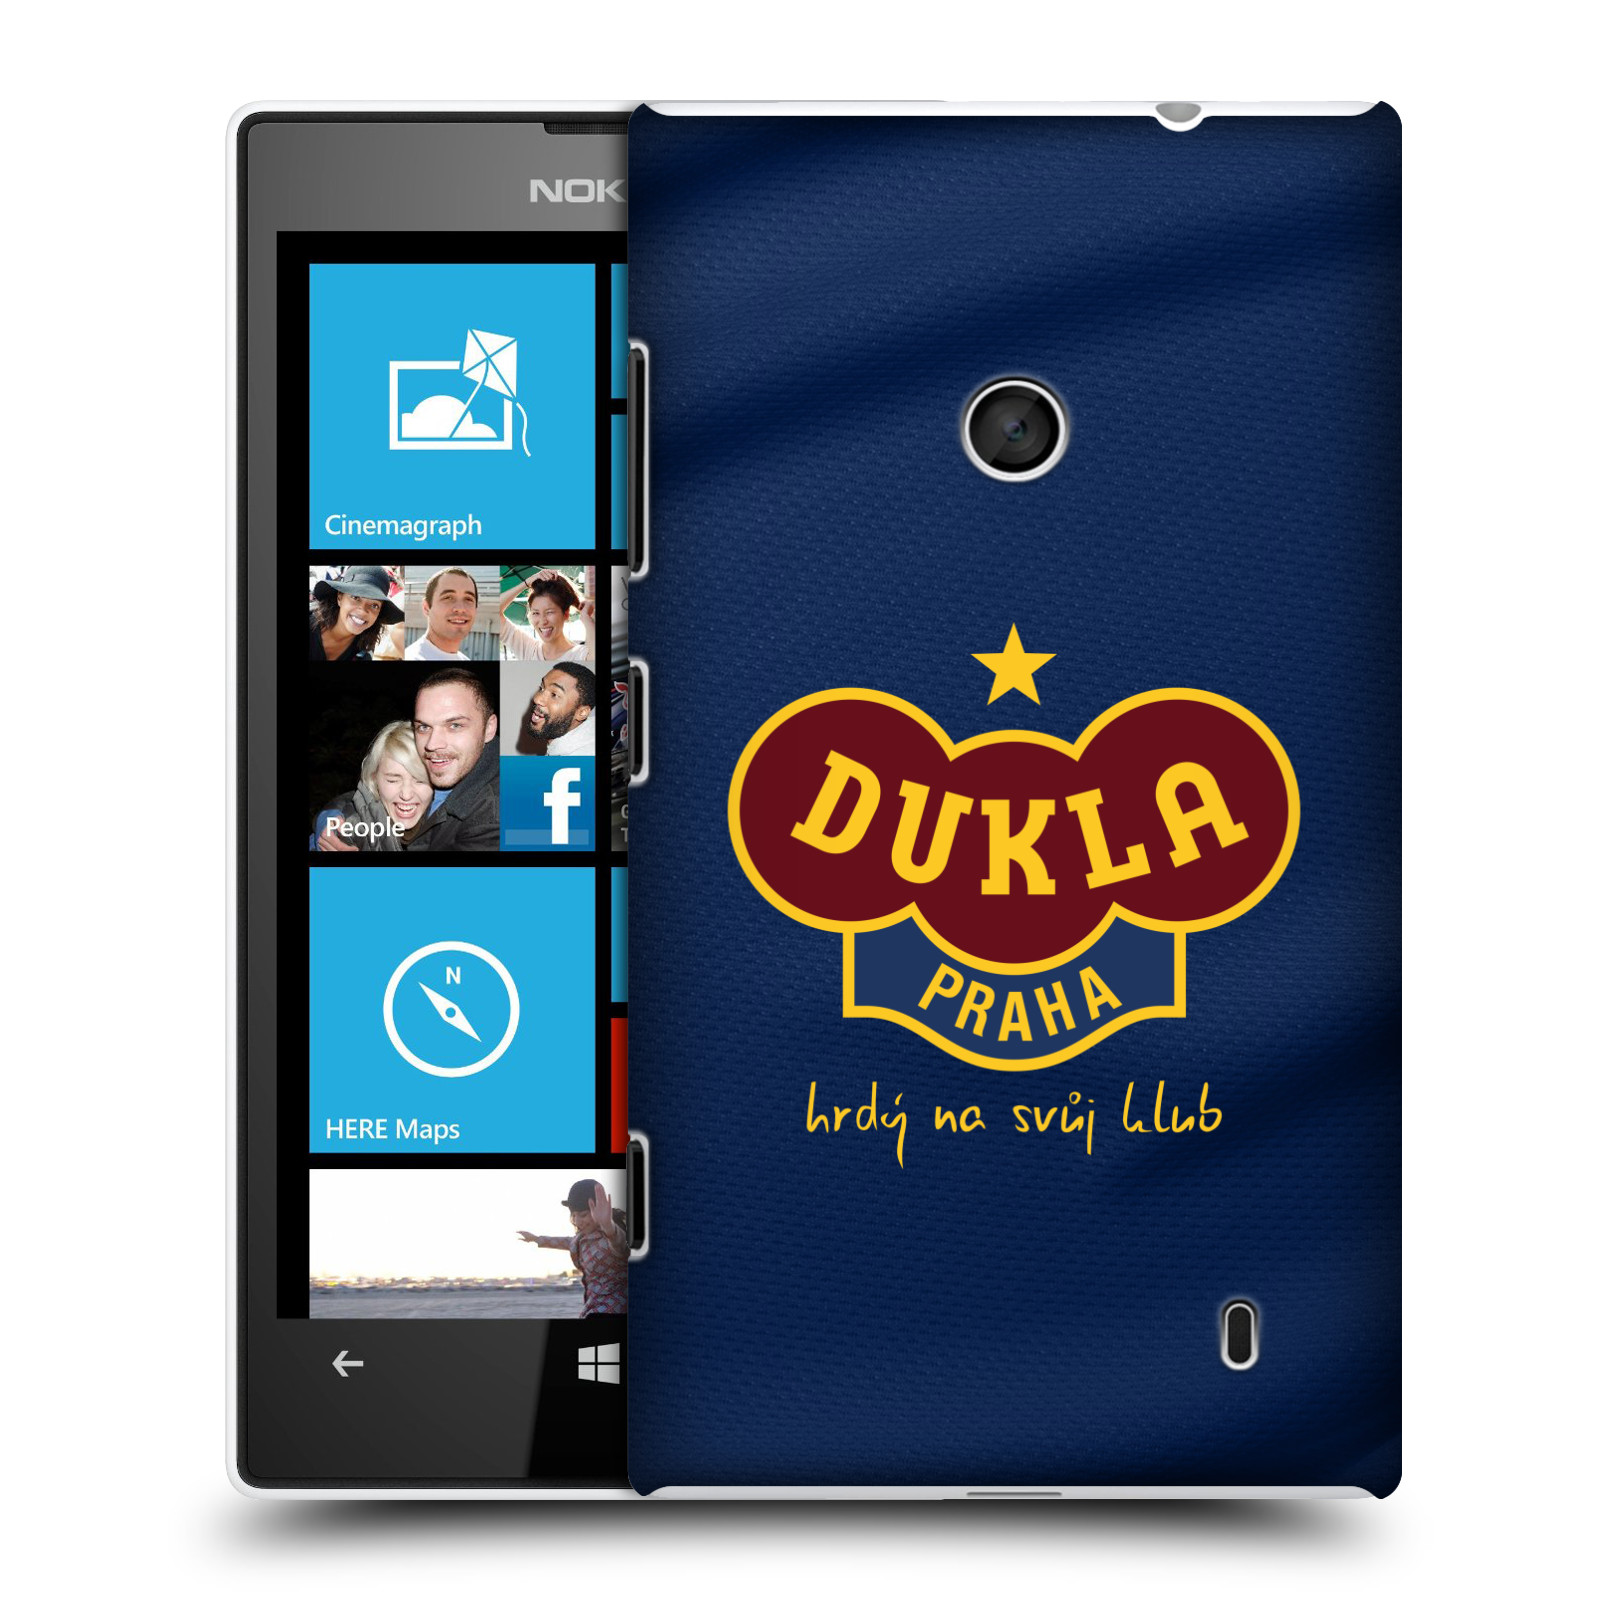 Plastové pouzdro na mobil Nokia Lumia 520 - FK Dukla Praha - Modrý dres